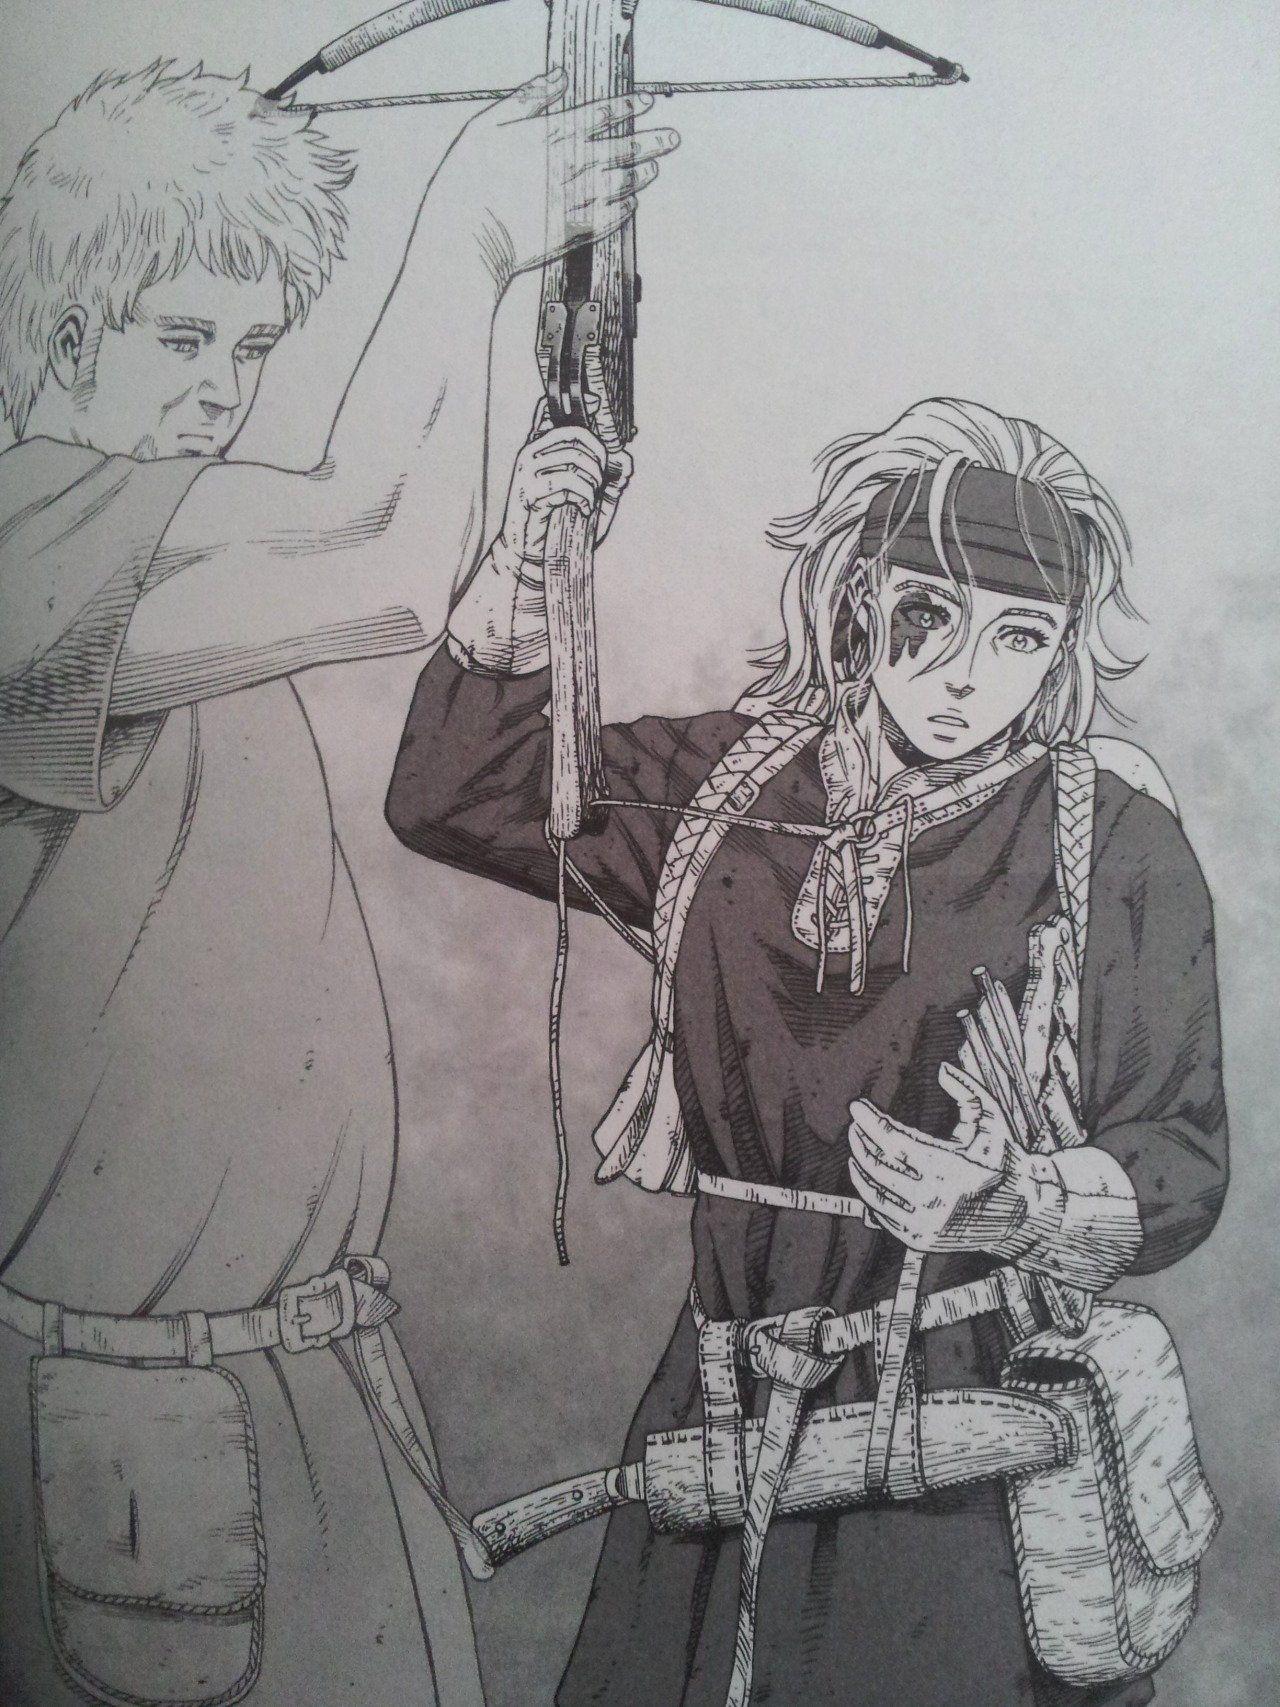 Best Drawing Book For Beginners Anime Reddit Luxury Keru World I Finished Book 9 Of Vinlandsaga Vol 17 In 2020 Anime Drawing Books Best Anime Drawings Cool Drawings